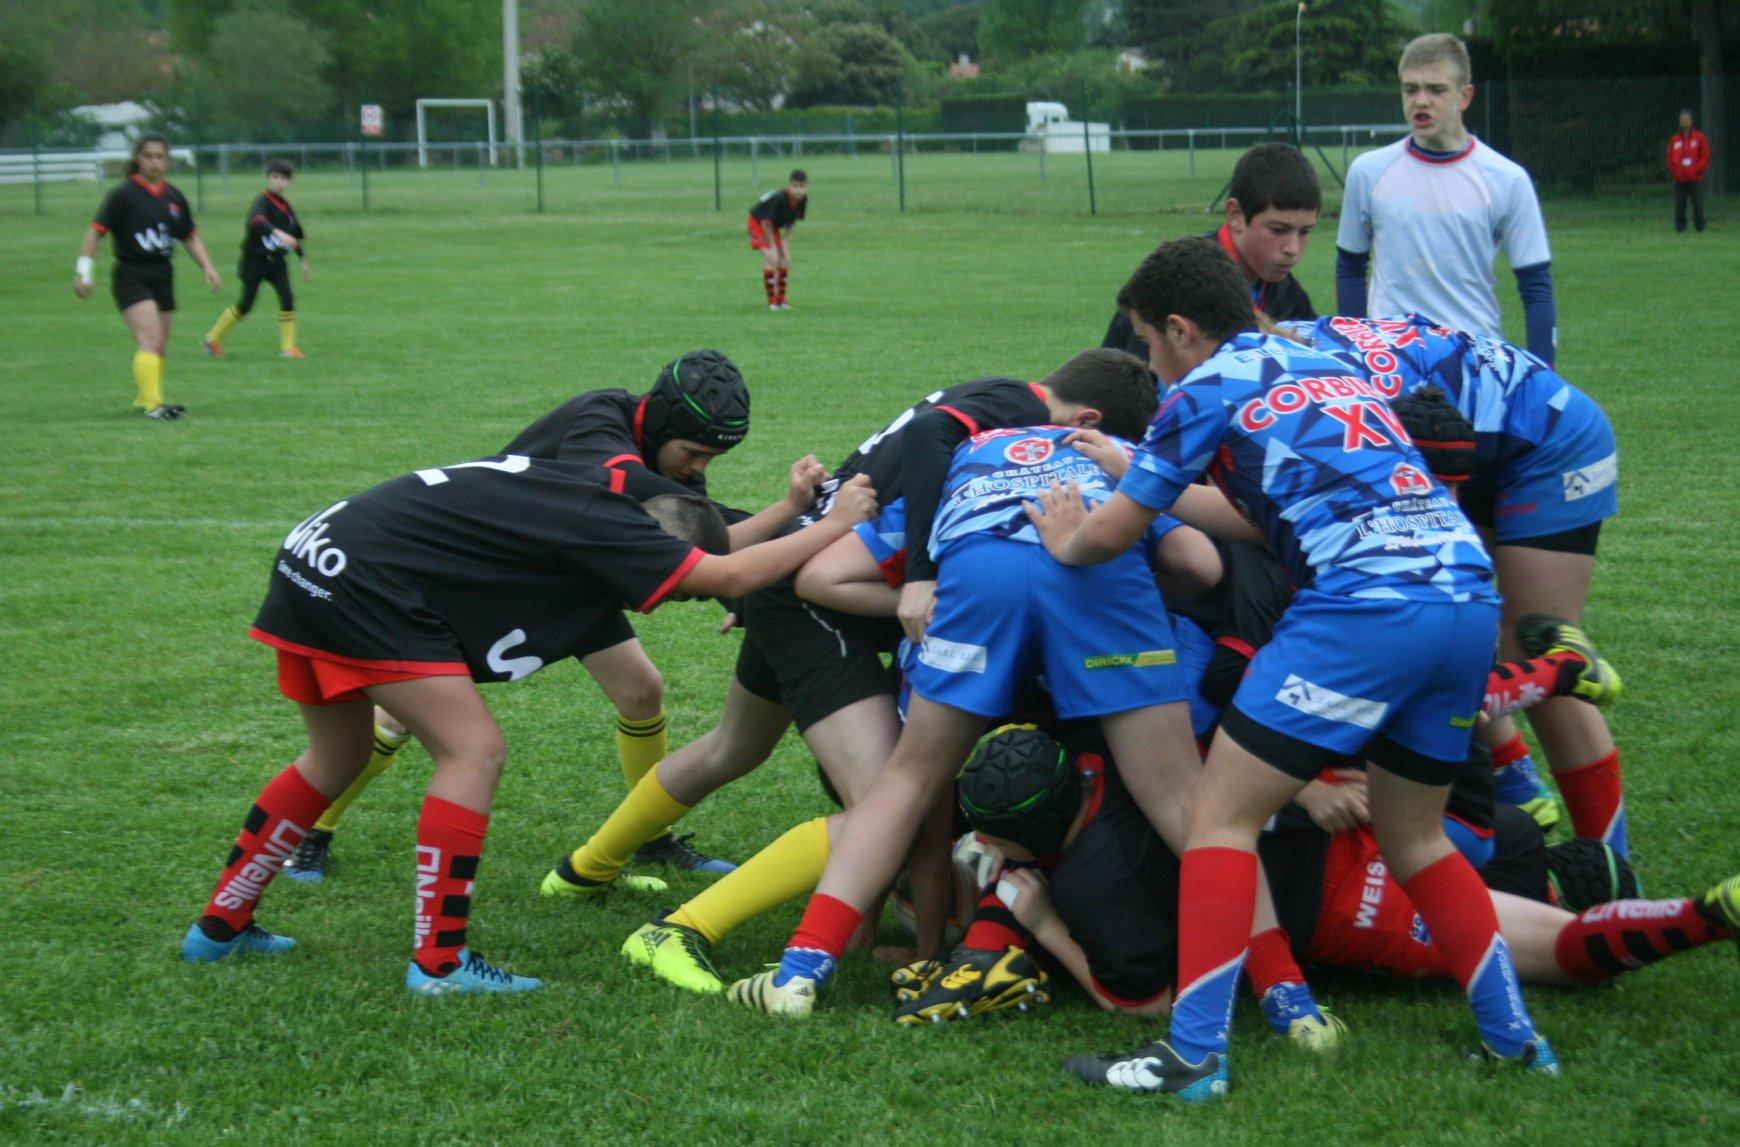 https://scg-rugby.com/wp-content/uploads/2018/05/31945328_1392406690904618_5483015671673520128_o.jpg